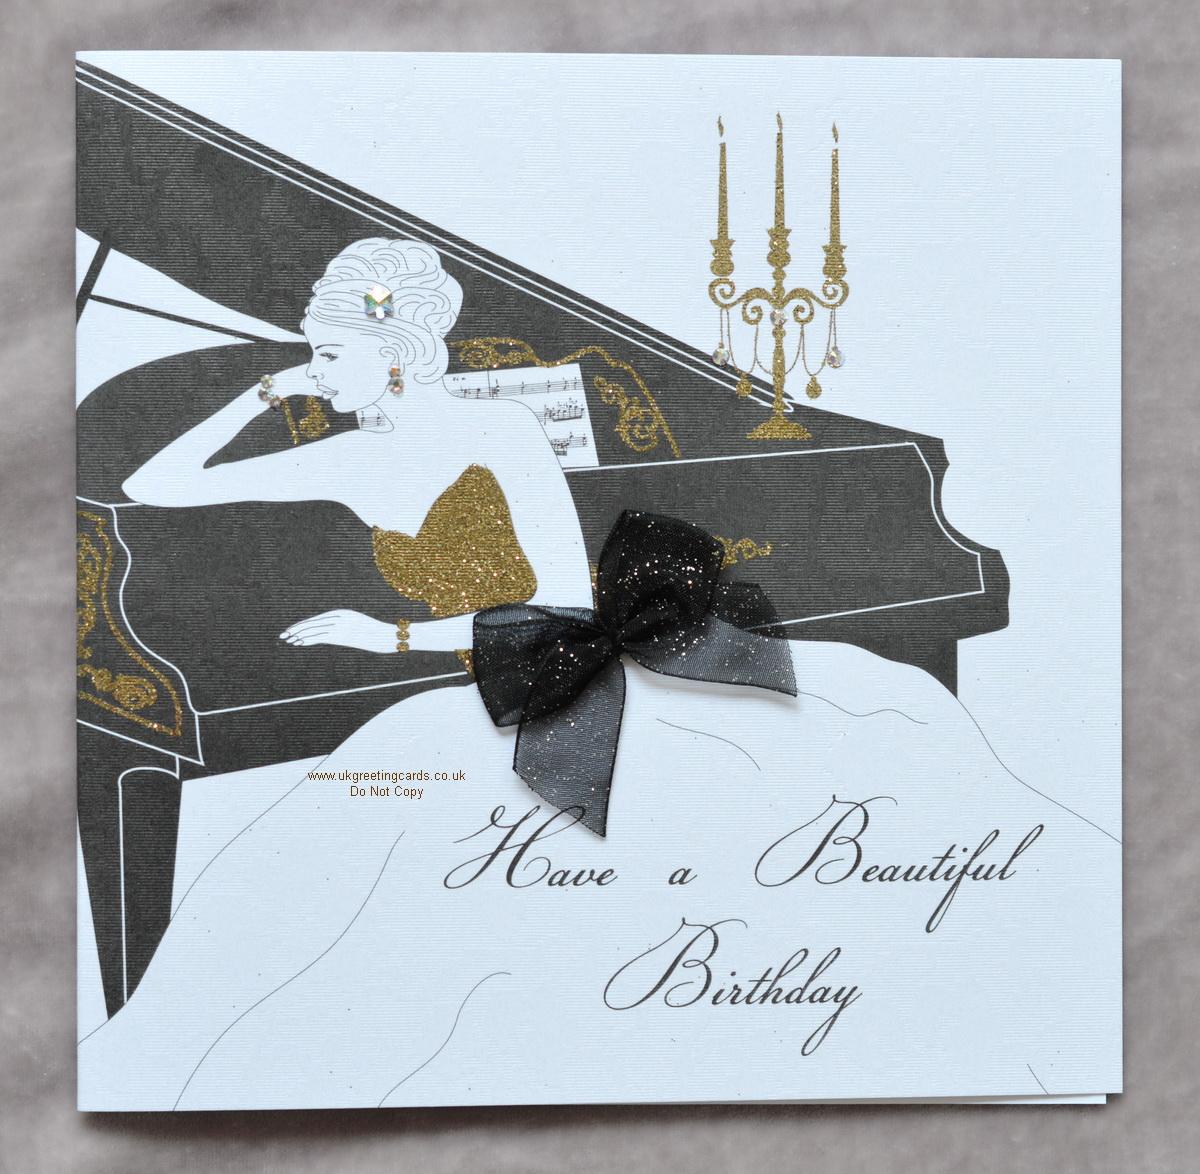 Handmade Greeting Cards Blog Birthday Cards For Women – Ladies Birthday Cards